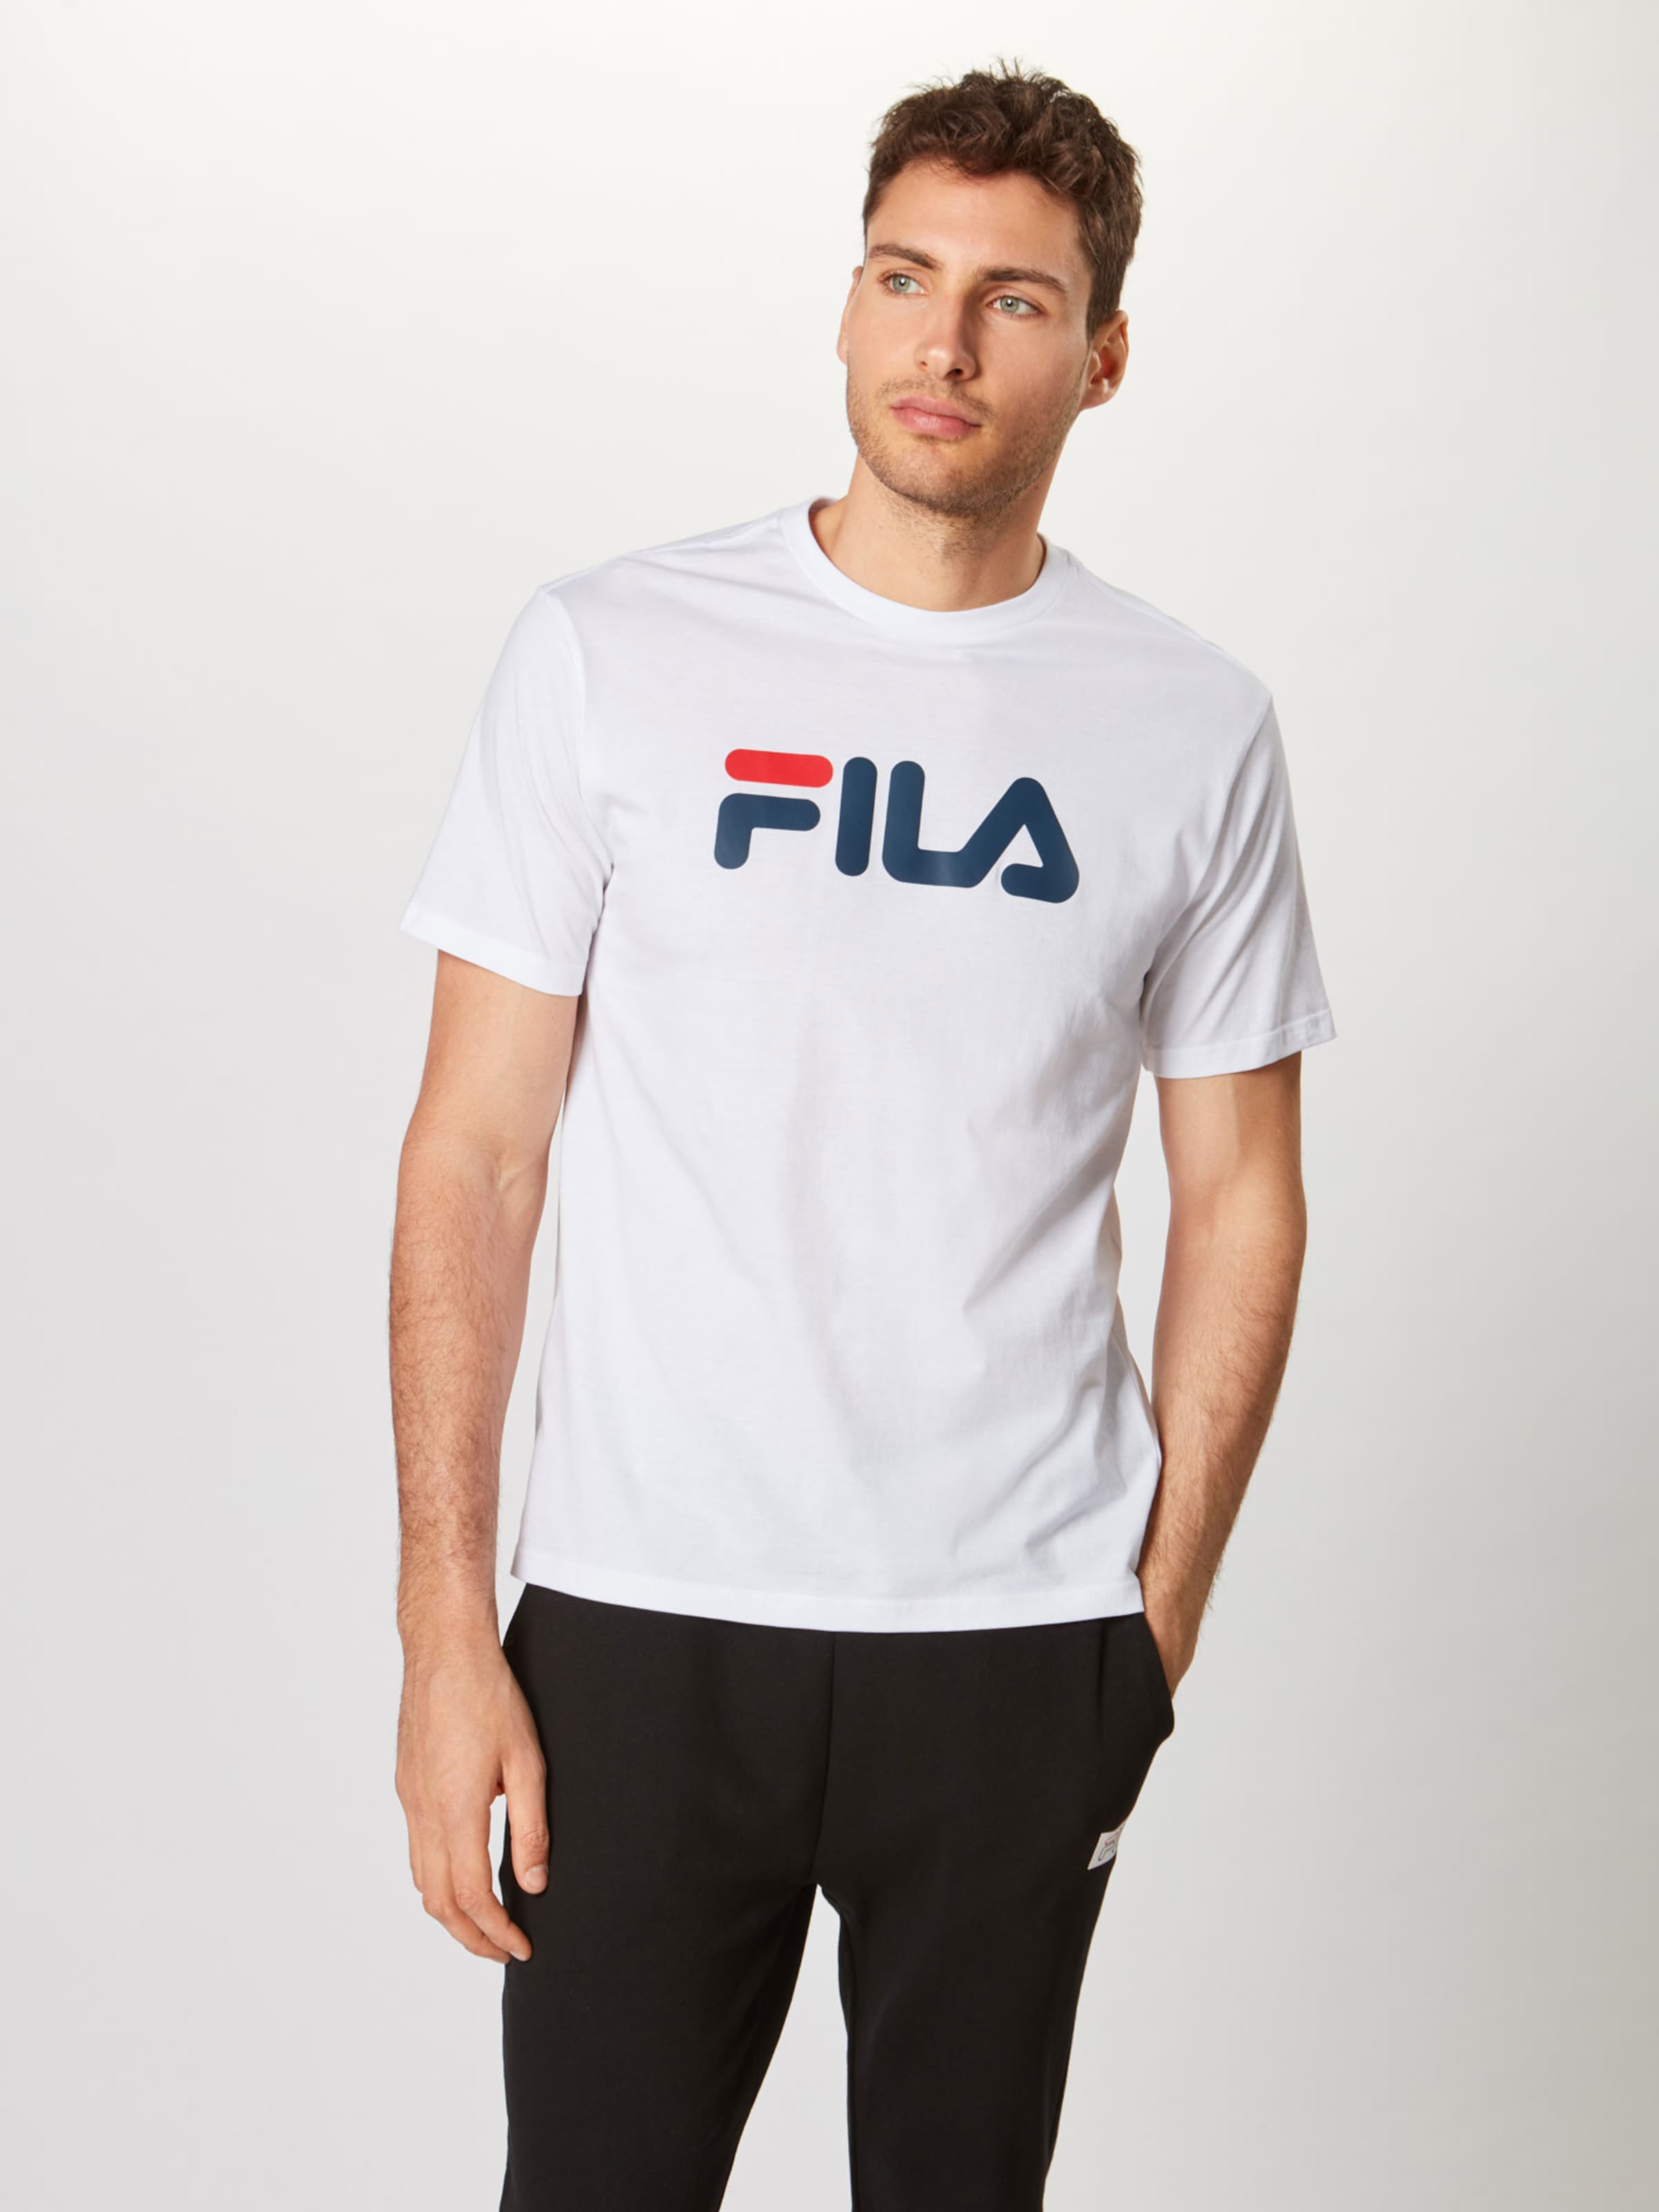 shirt Fila T FoncéBlanc En 'pure' Bleu yb6Yf7g